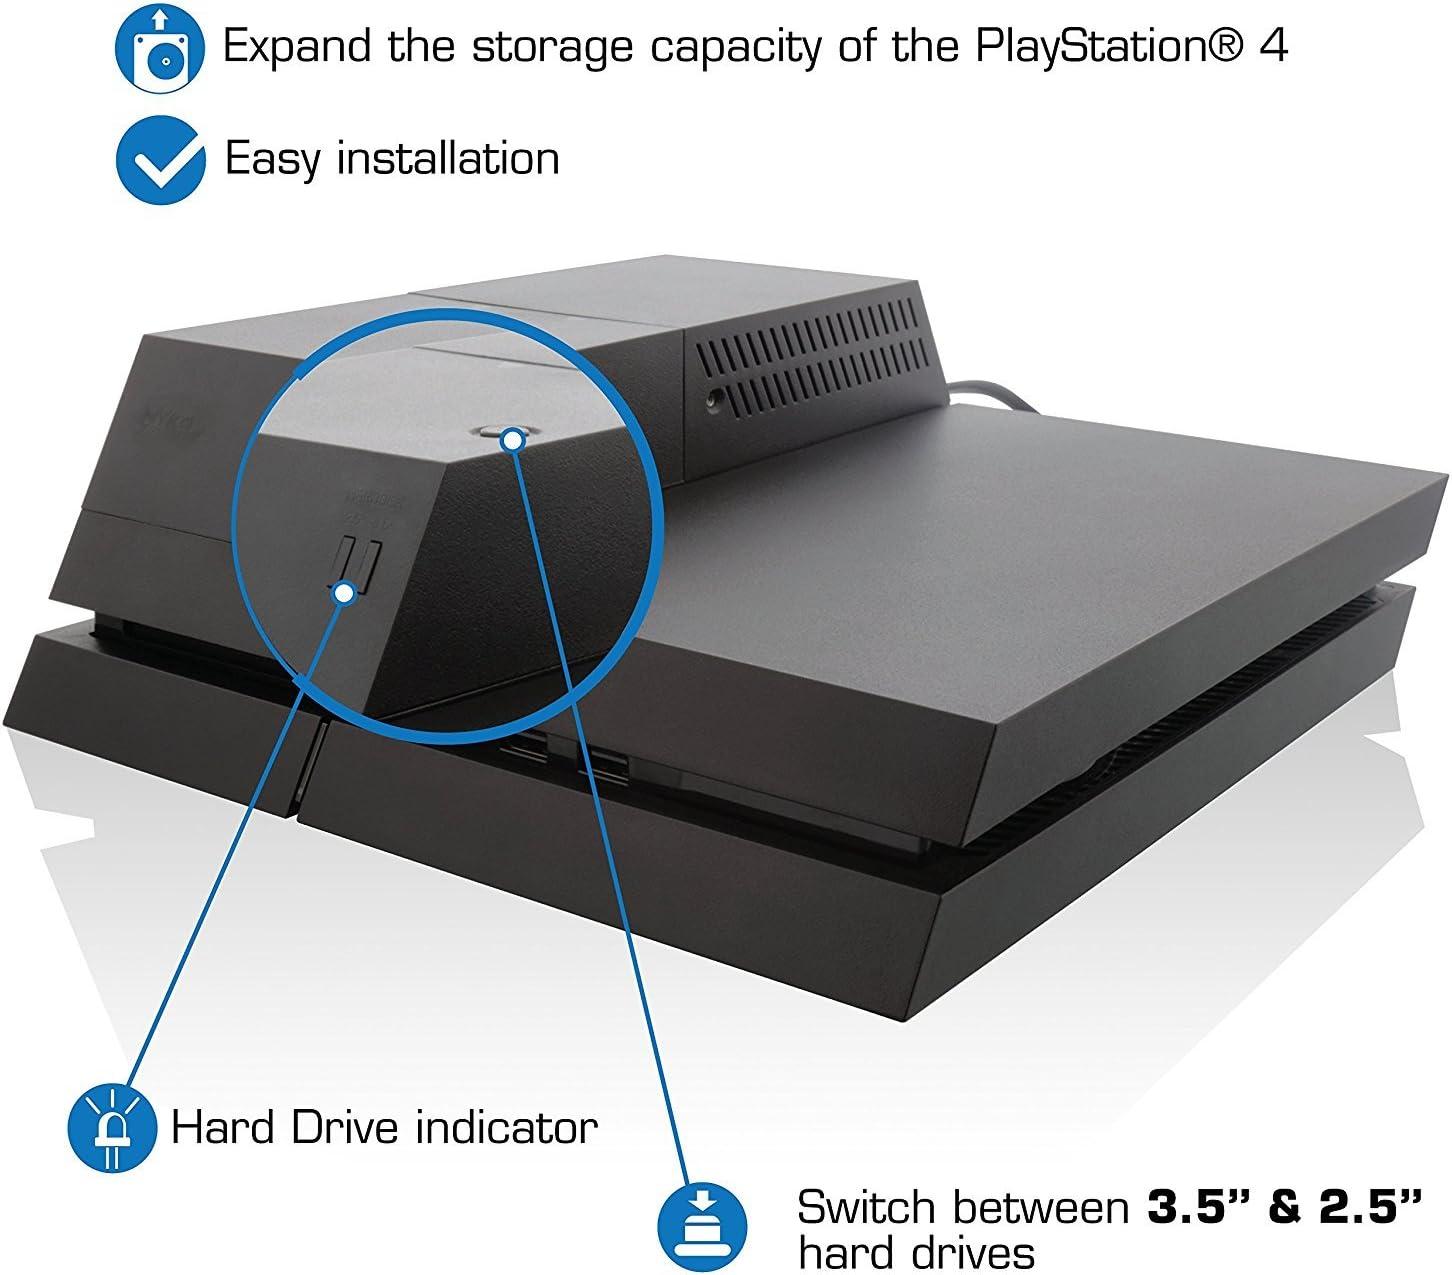 Playstation 4 Block Diagram Schematics Wiring 3 Circuit Amazon Com Nyko Data Bank Video Games Connections